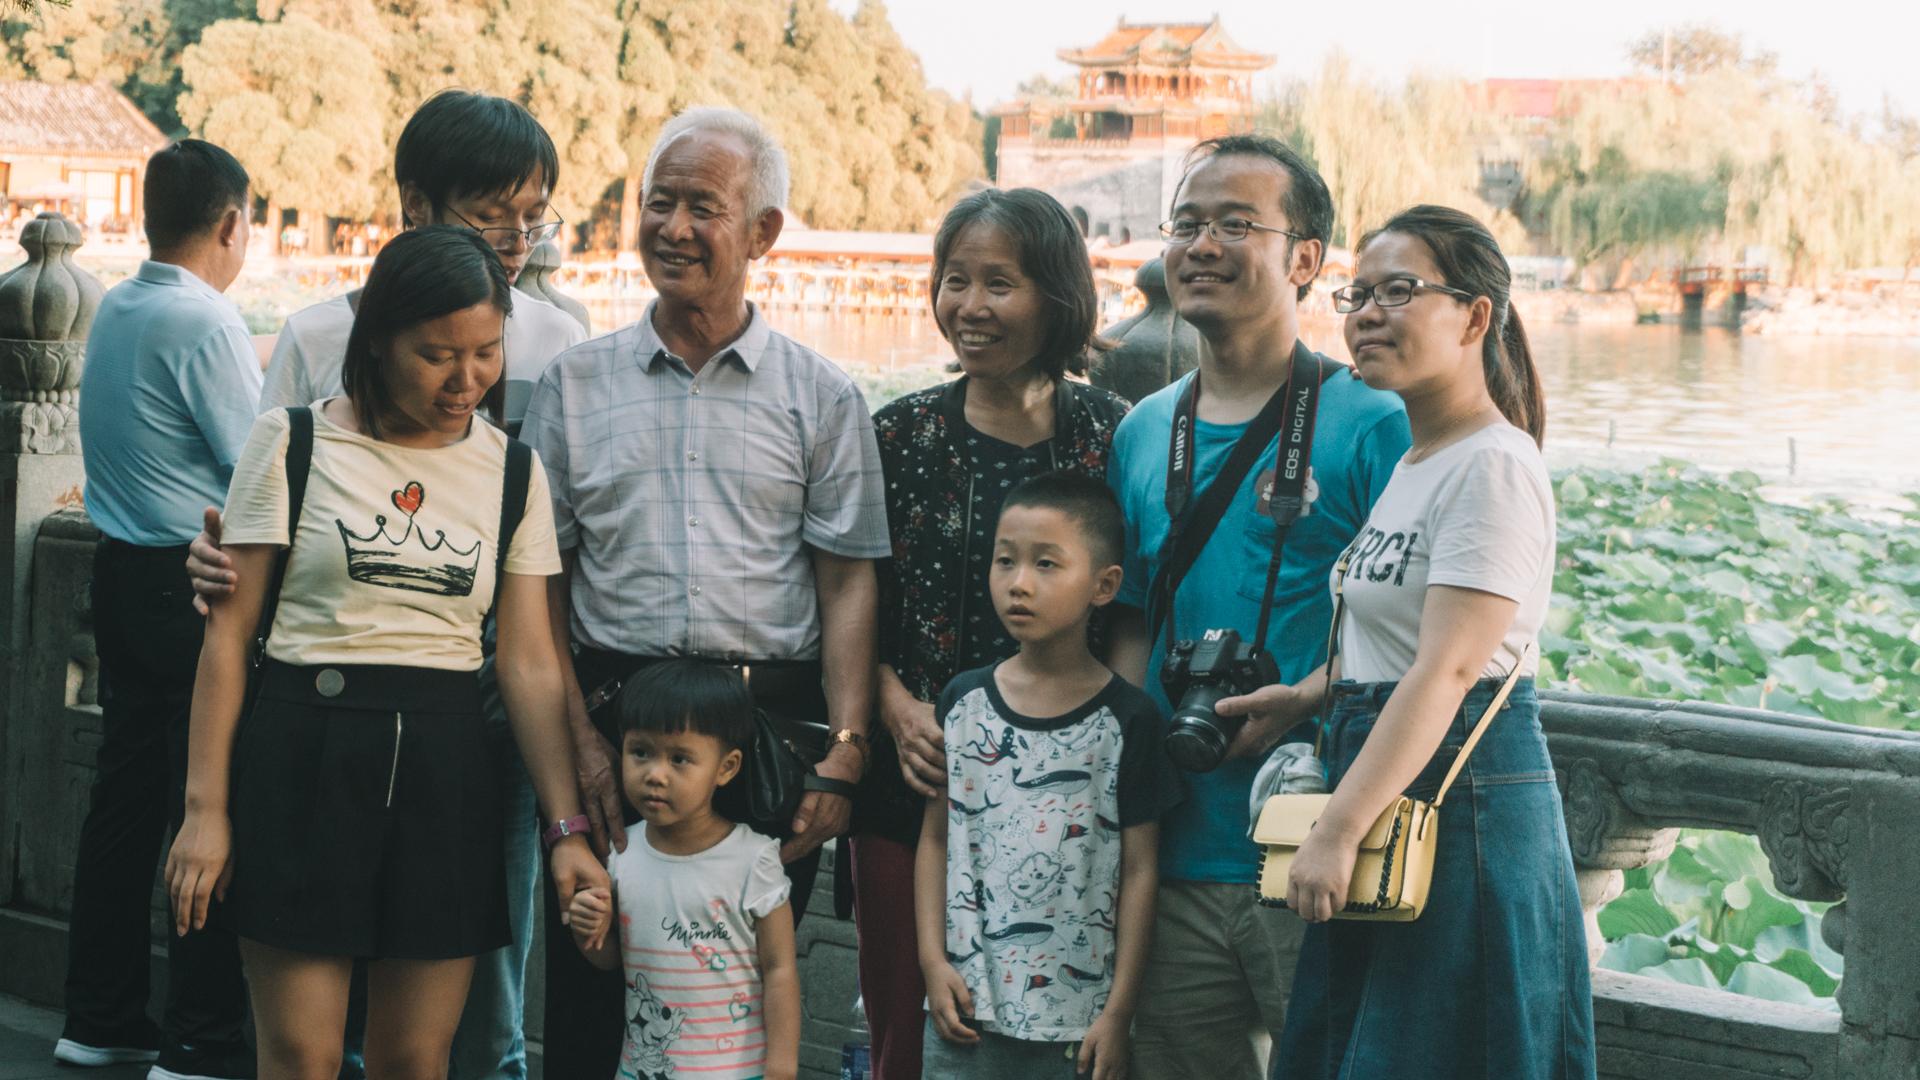 DSC09649_pechino_summer_palace_travel_psych_chiara_cina_china